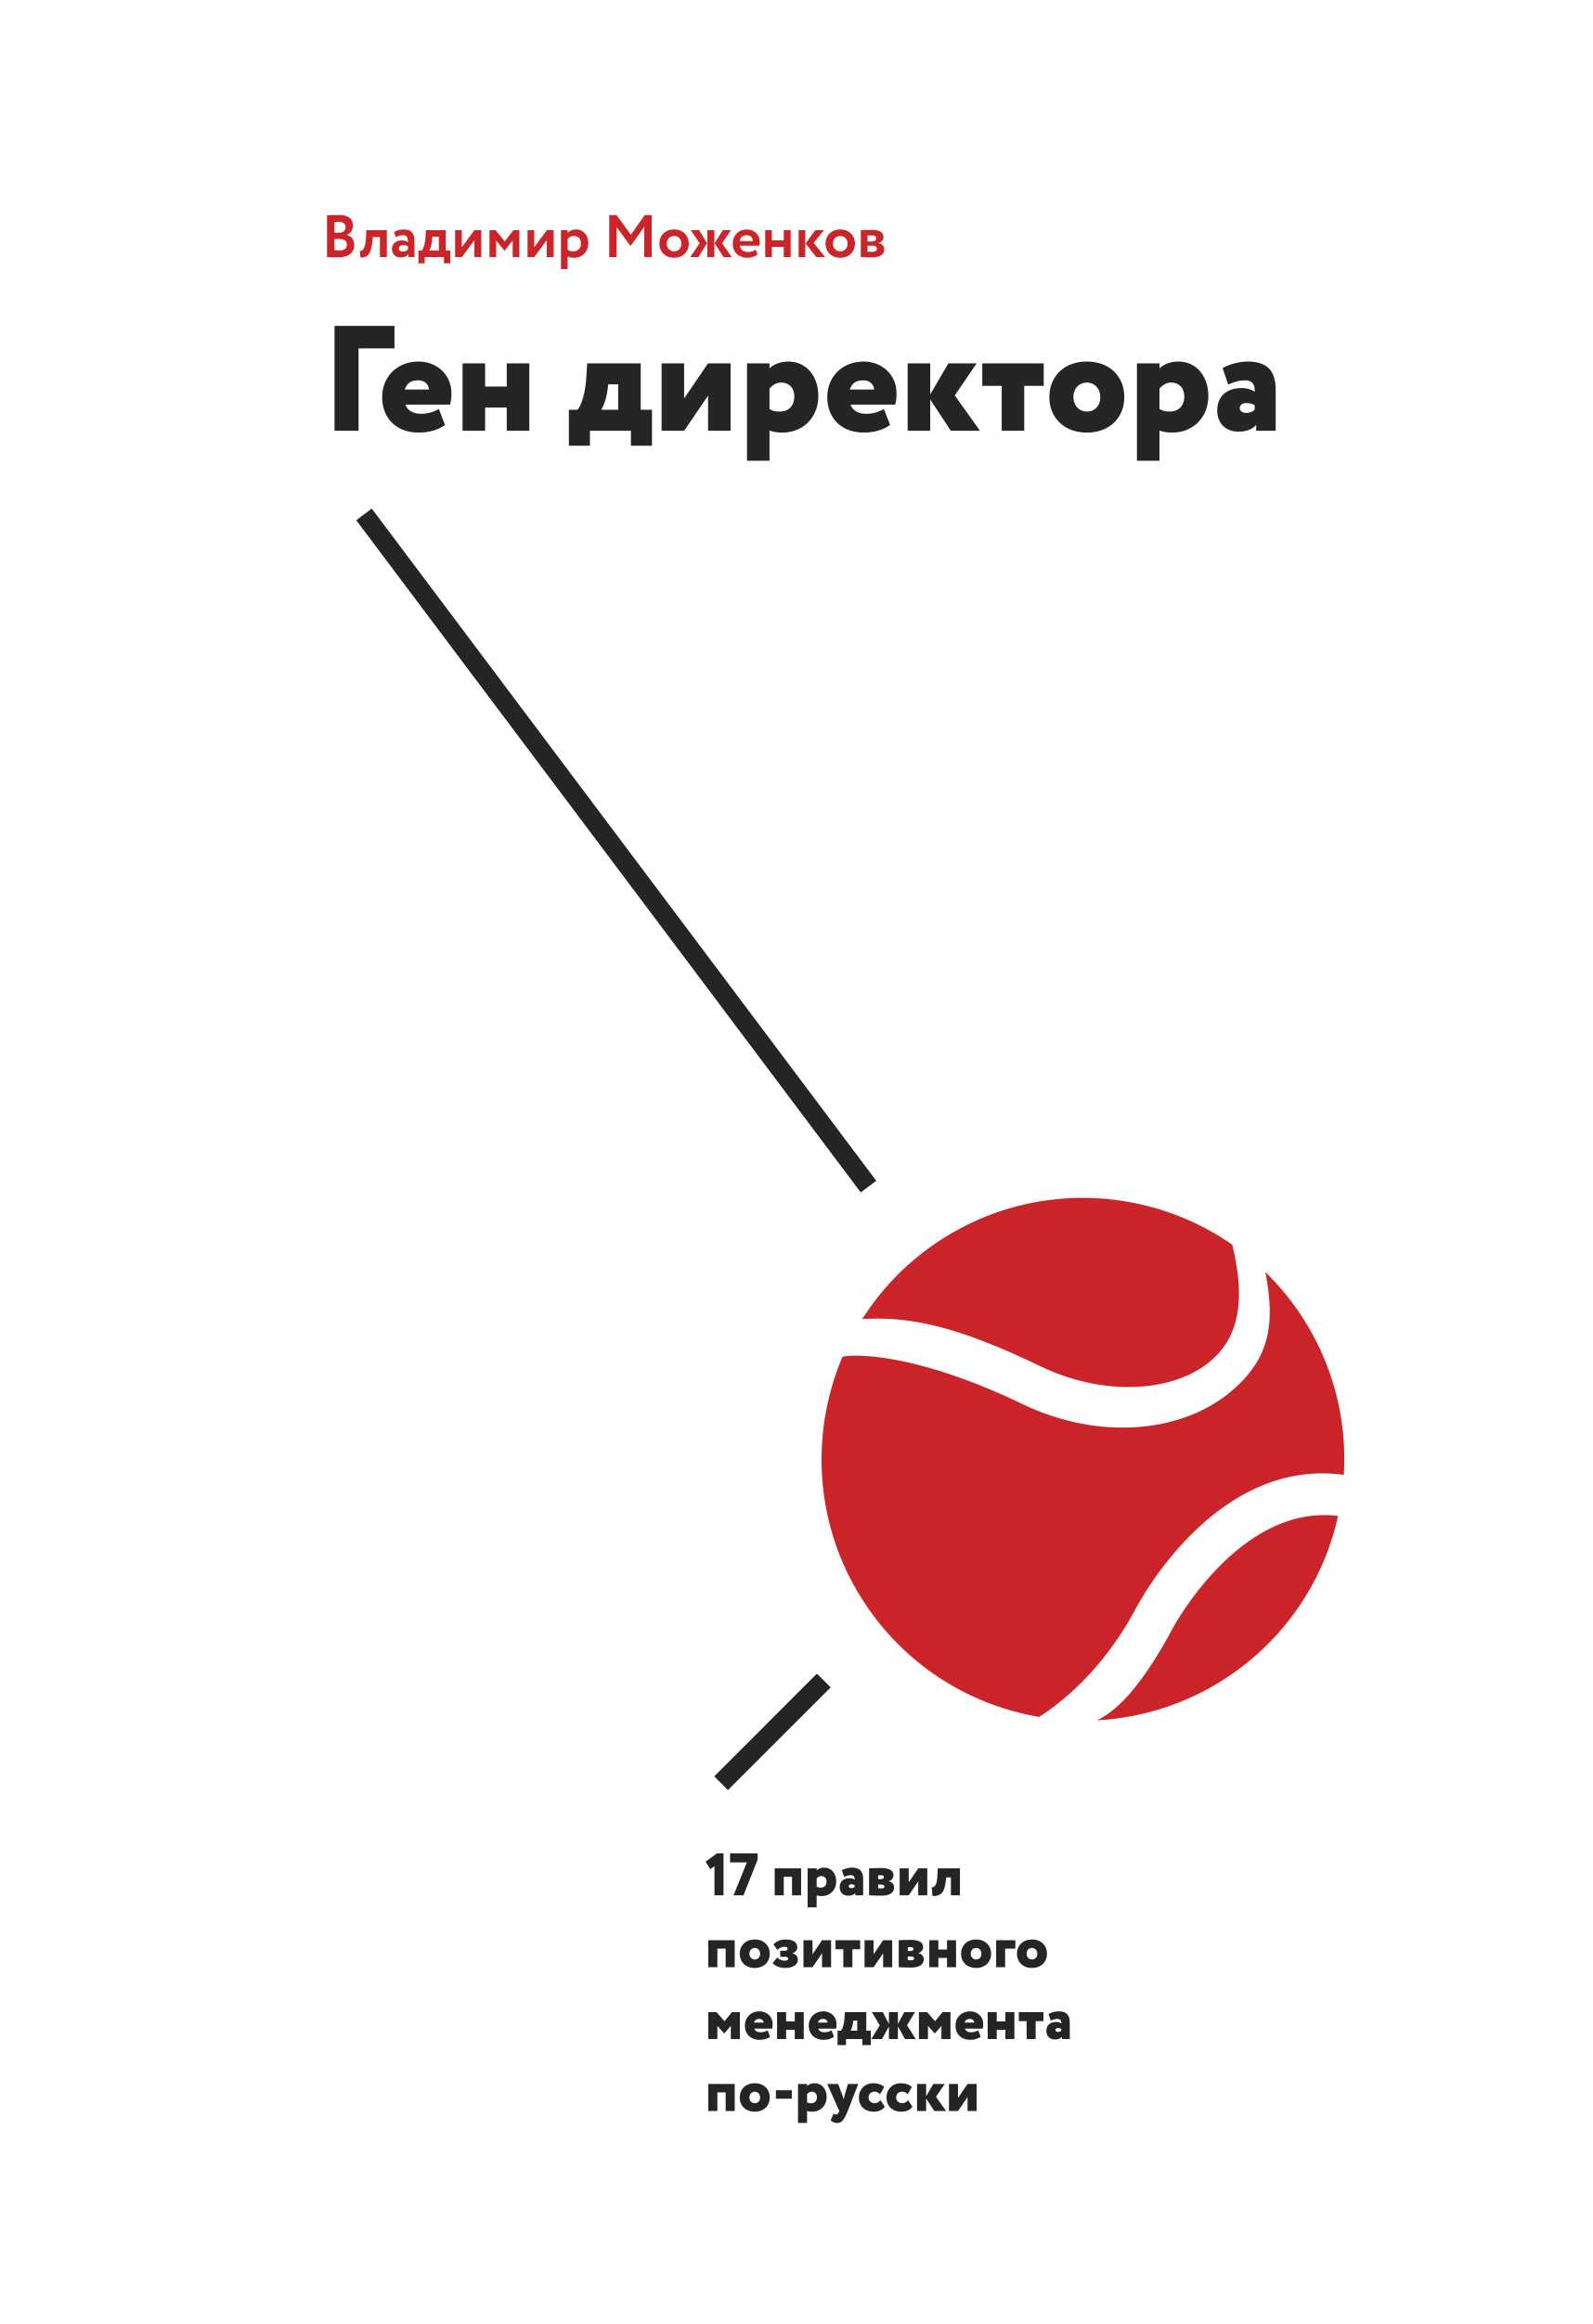 Владимир Моженков Ген директора. 17 правил позитивного менеджмента по-русски бронепровода на ауди 100